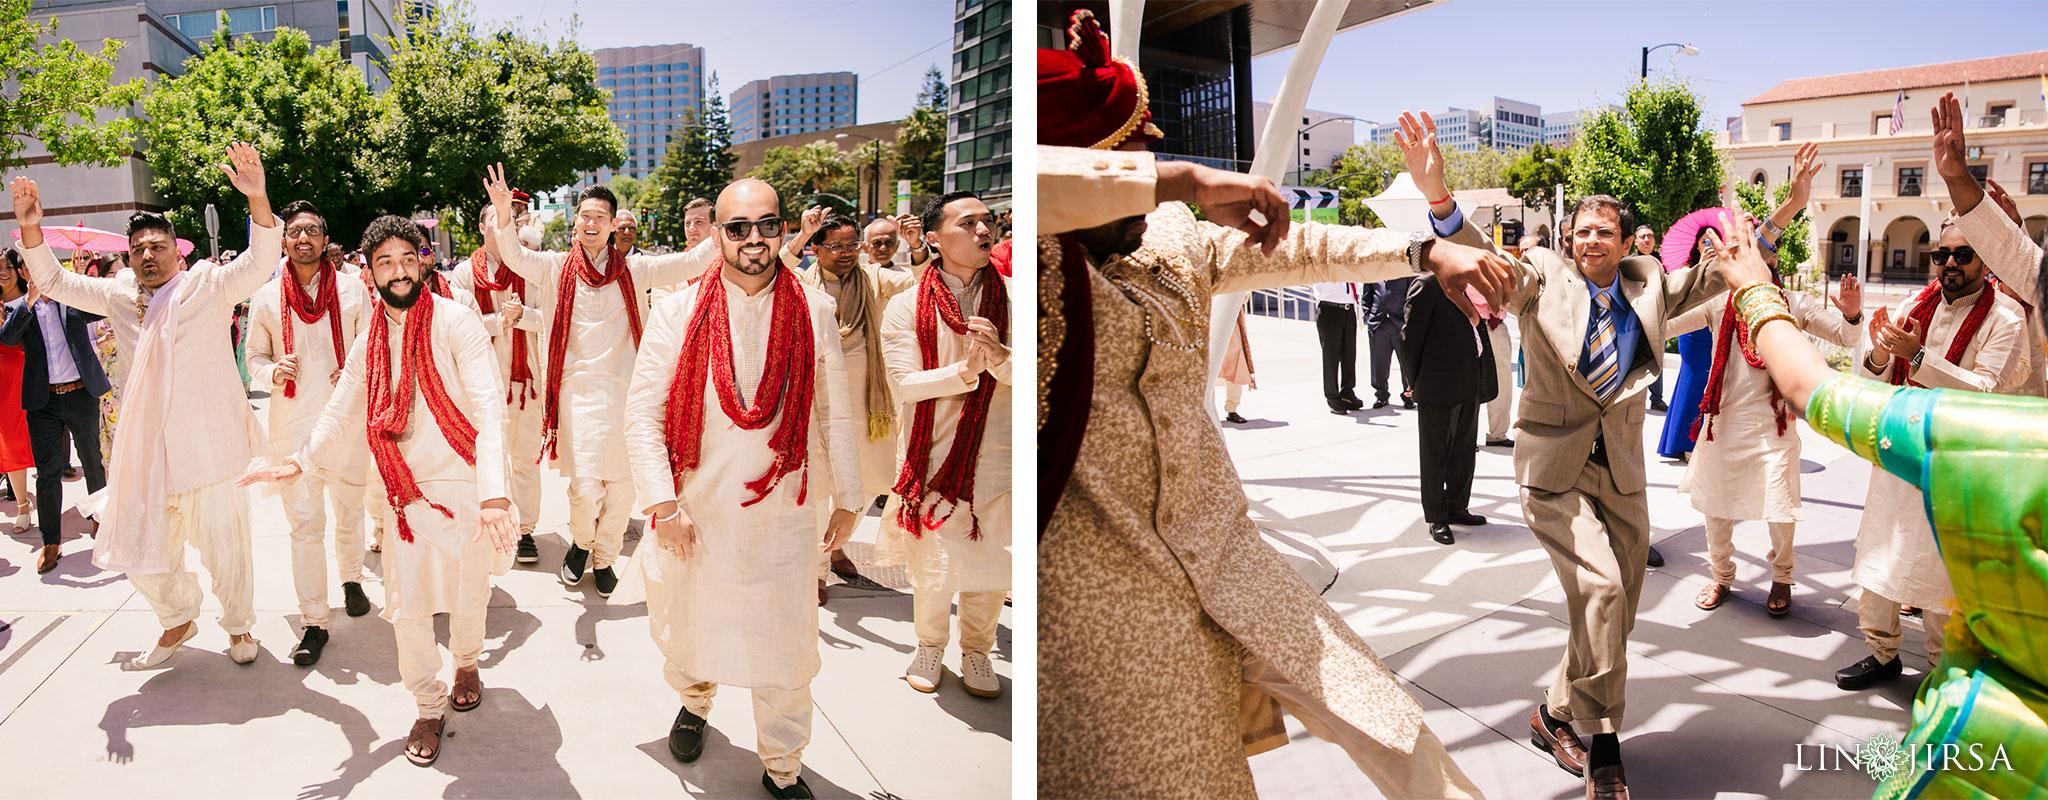 011 san jose marriott indian wedding photography